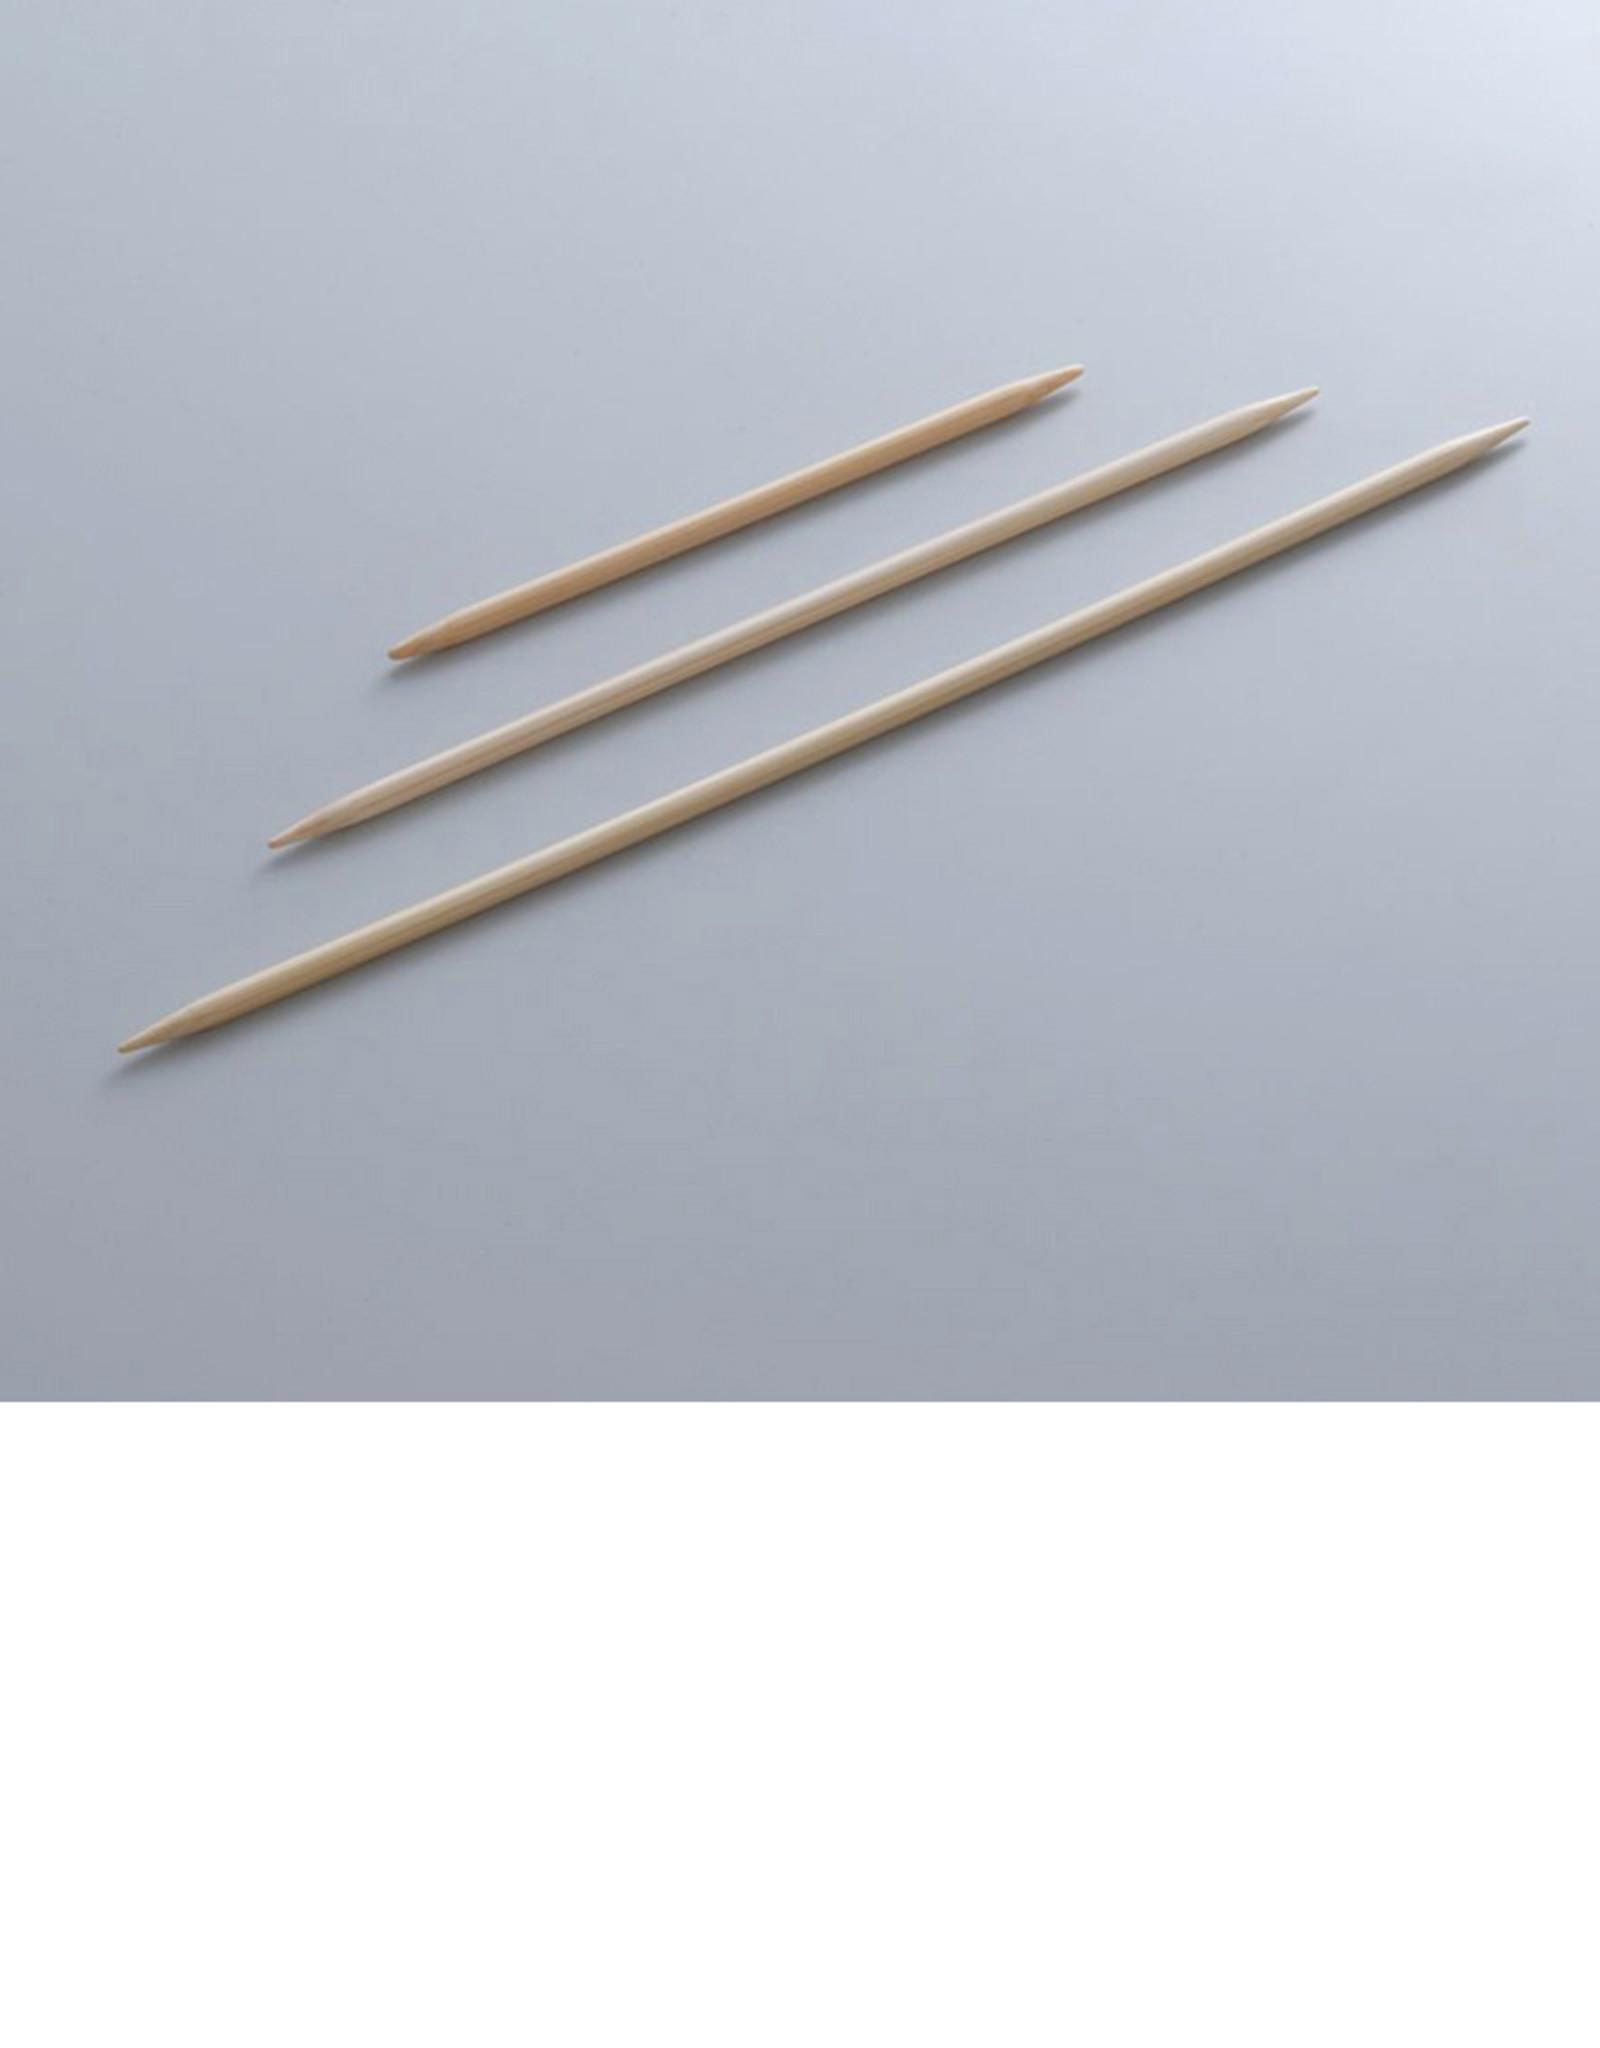 Kinki Amibari KA Double Point Needles US 5